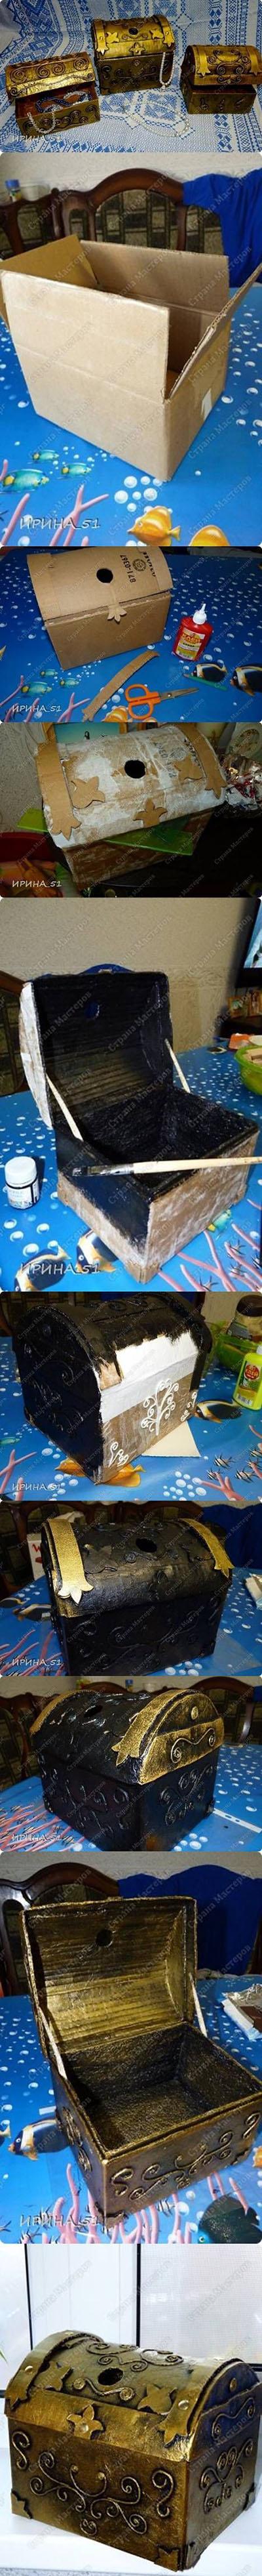 12 SUCH A CUTE Cardboard Jewelry Treasure Box 1a9e1738